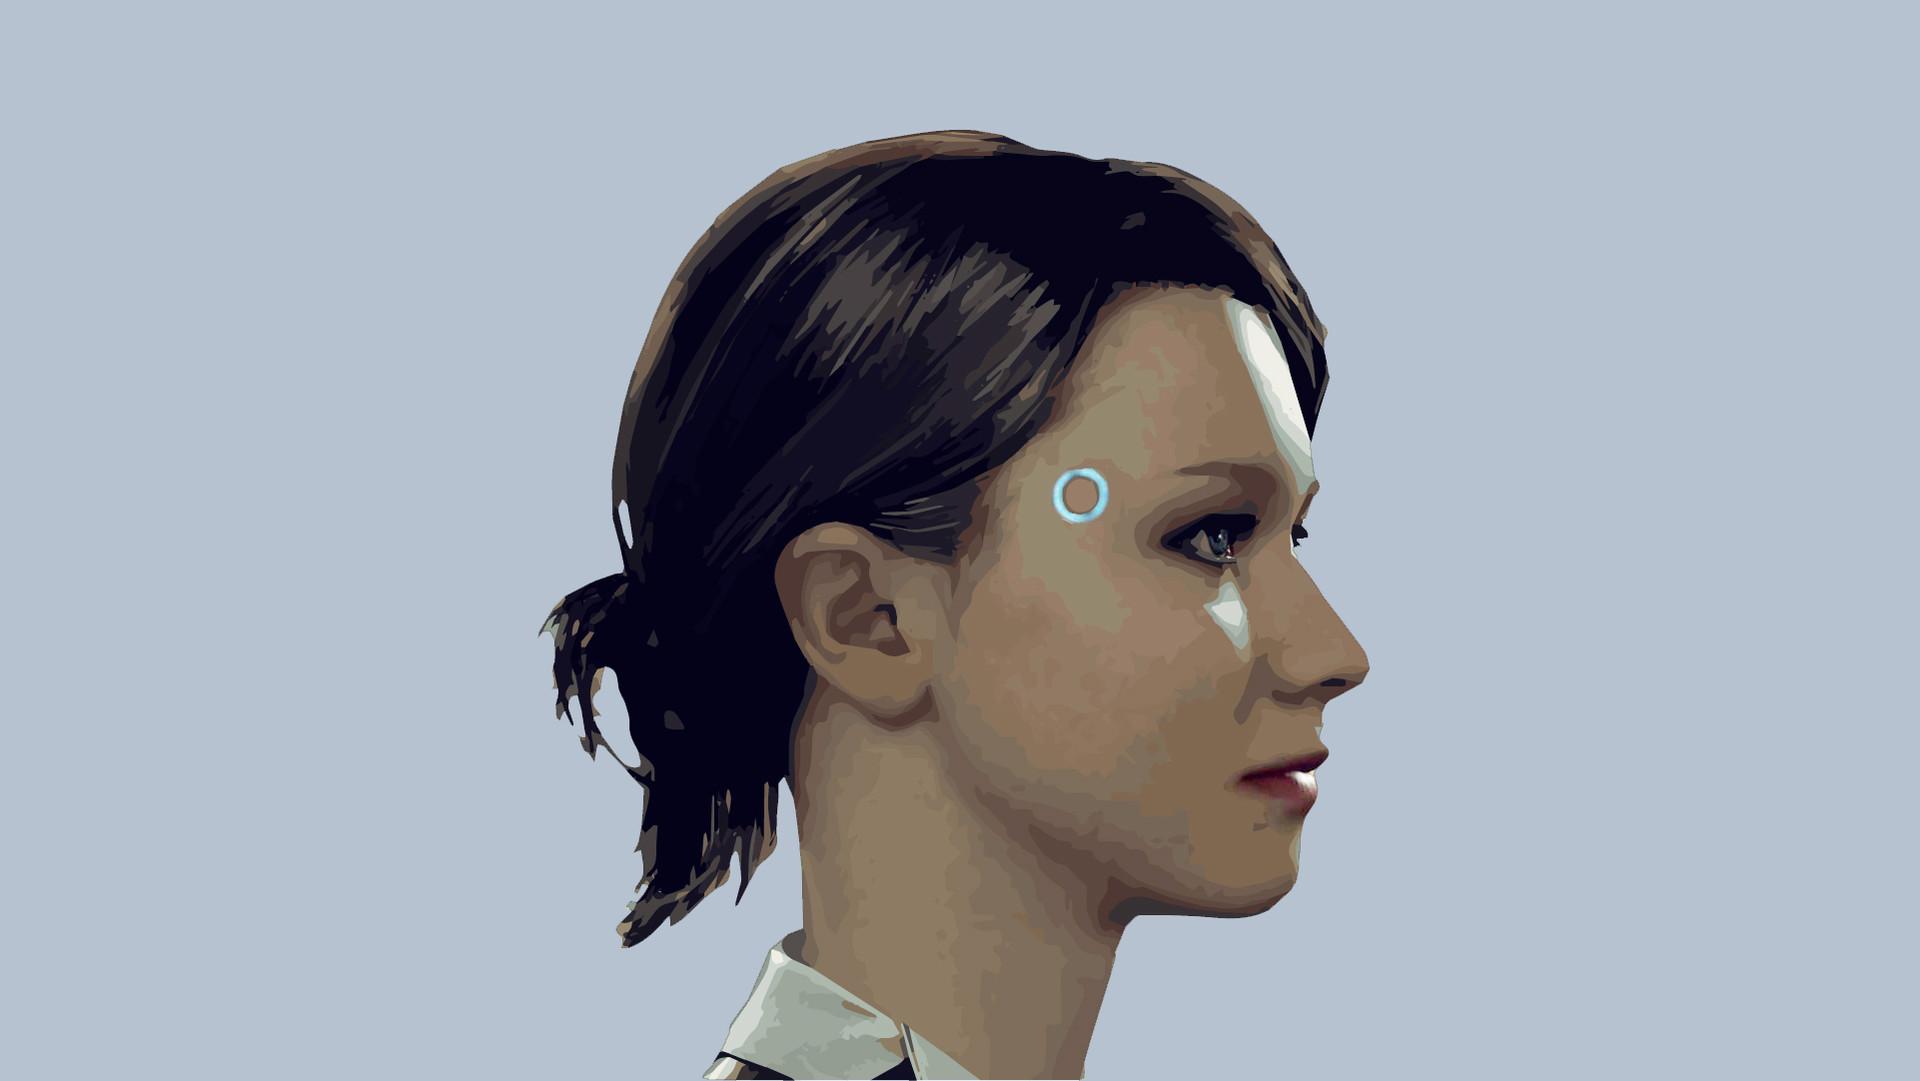 About >> ArtStation - Detroit Become Human Kara, Red Head